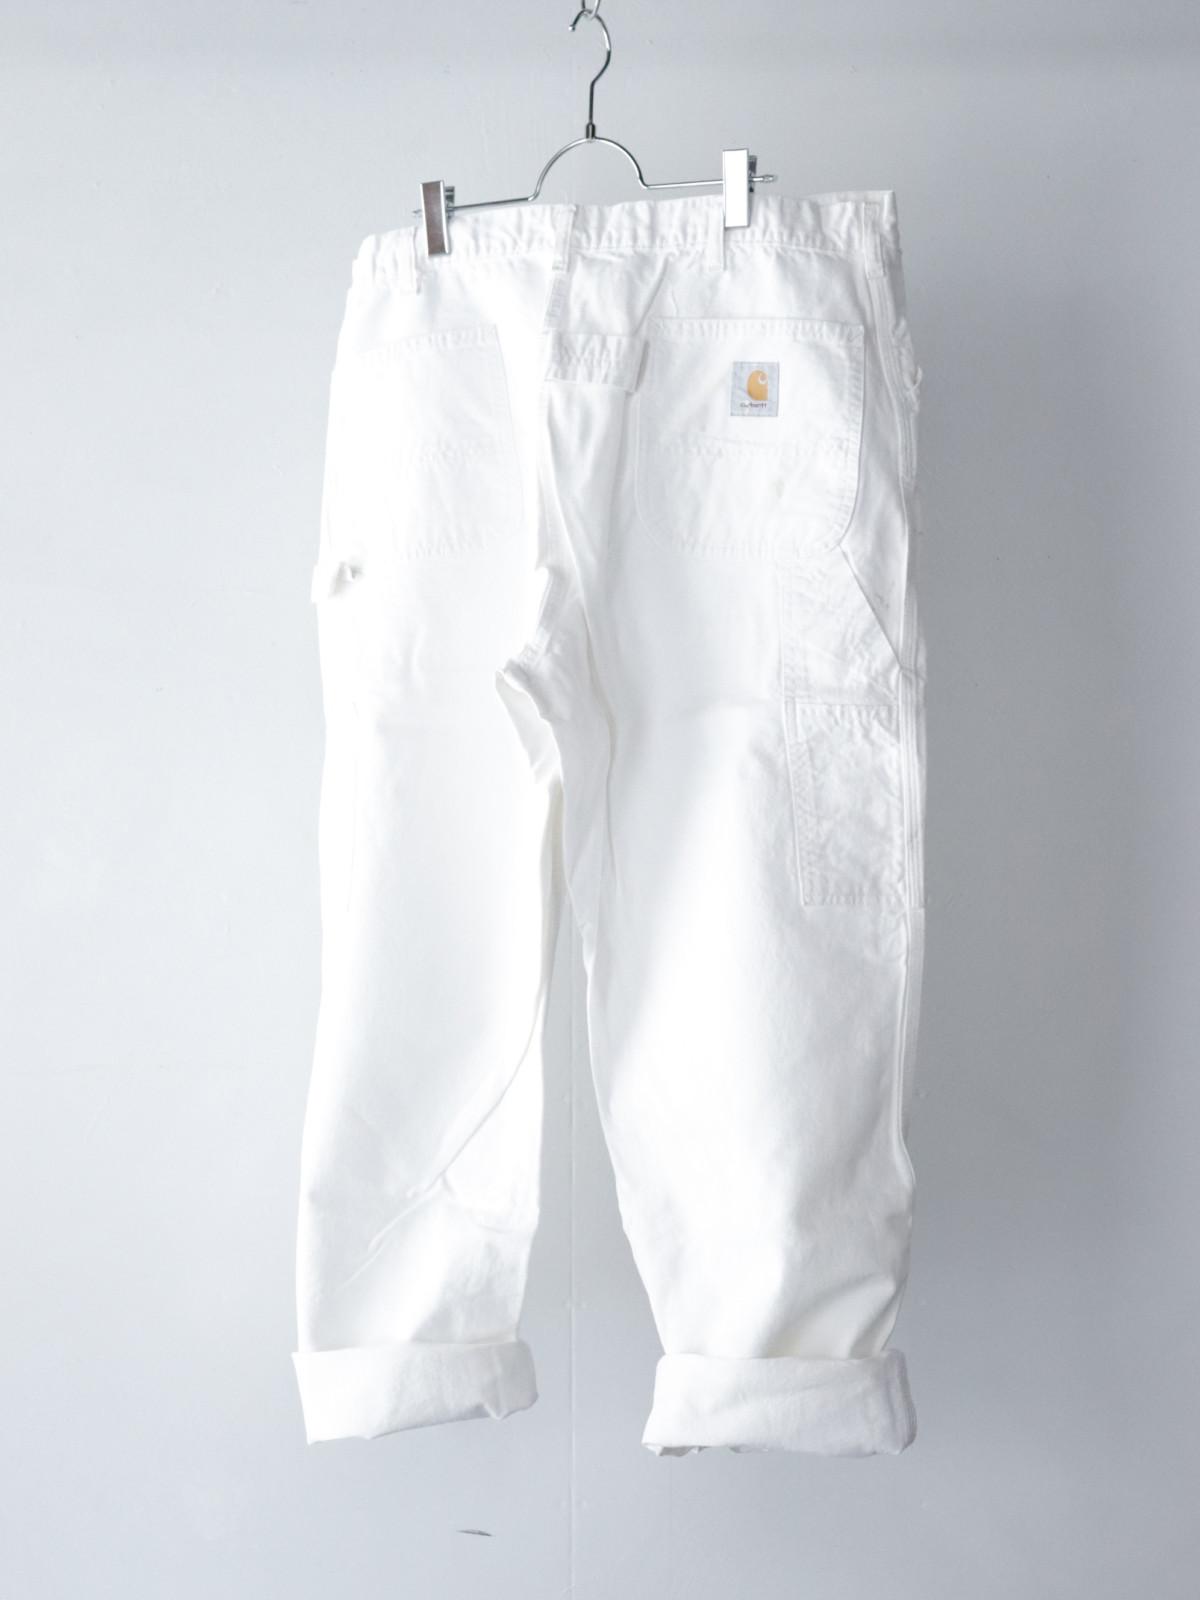 Carhartt, painter pants,USA,